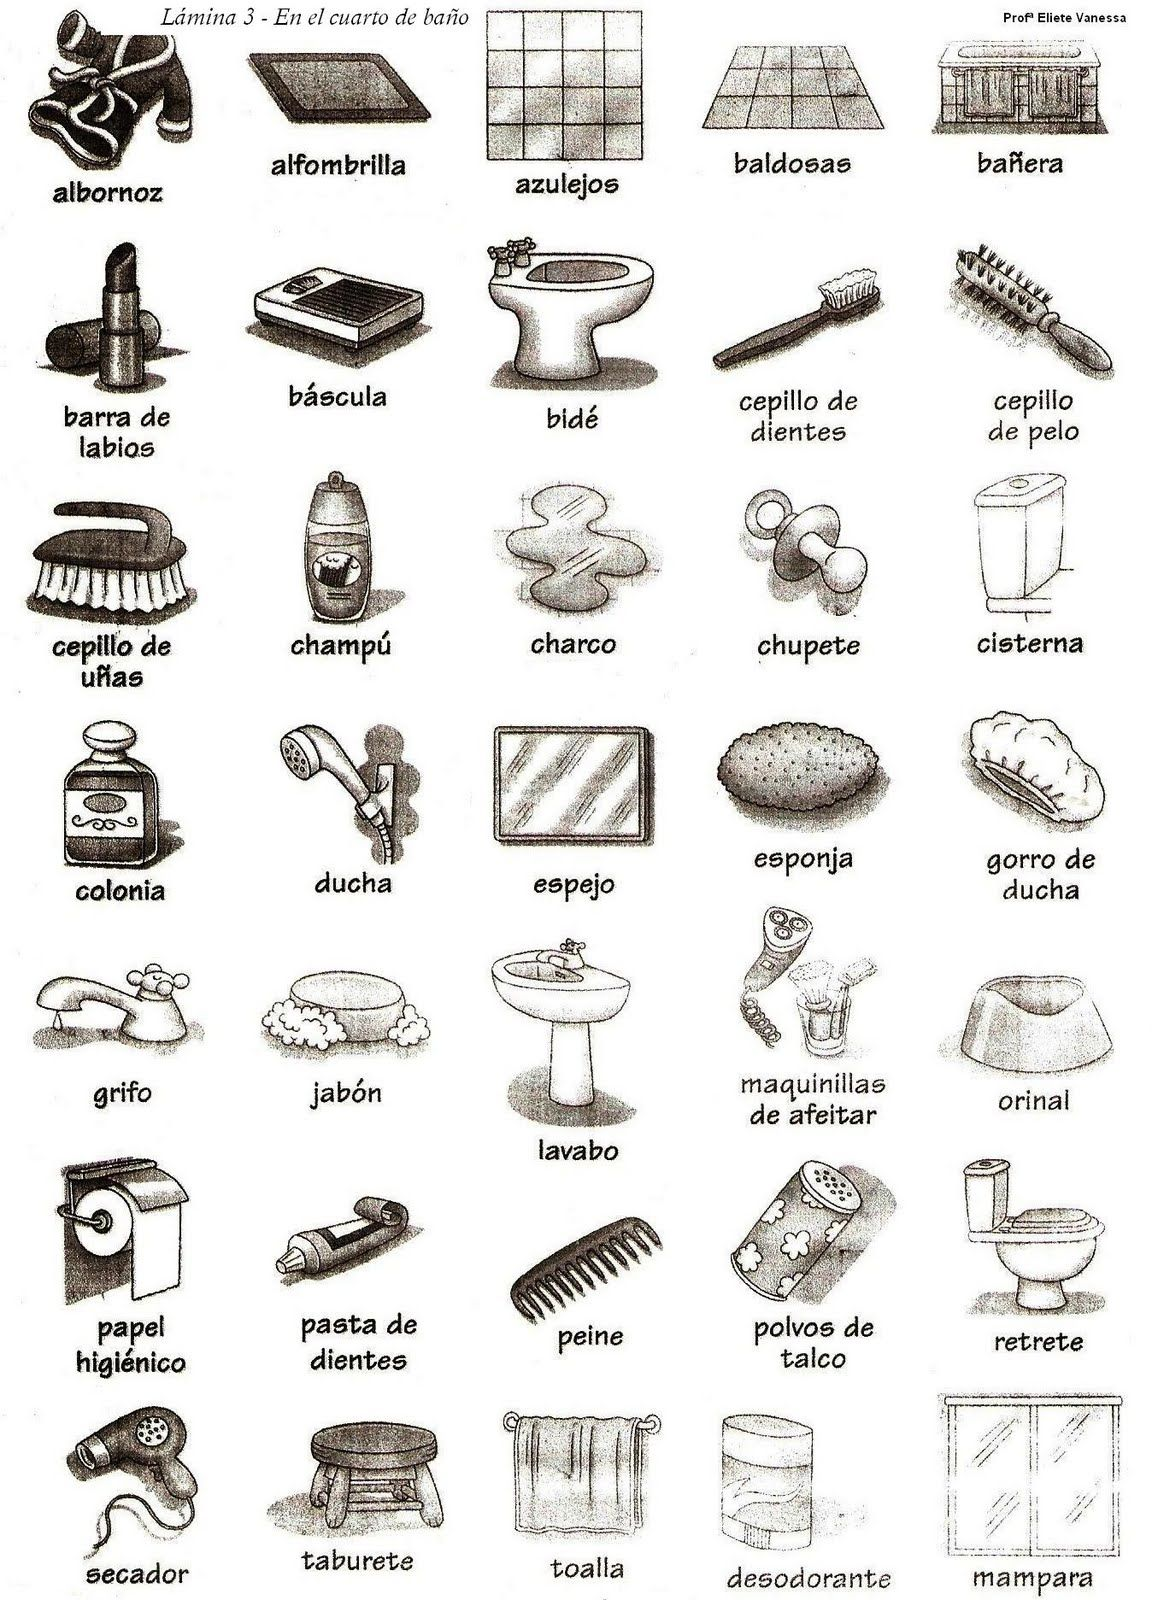 El Cuarto De Bano Spanish Vocabulary For Bathroom Spanish Languages